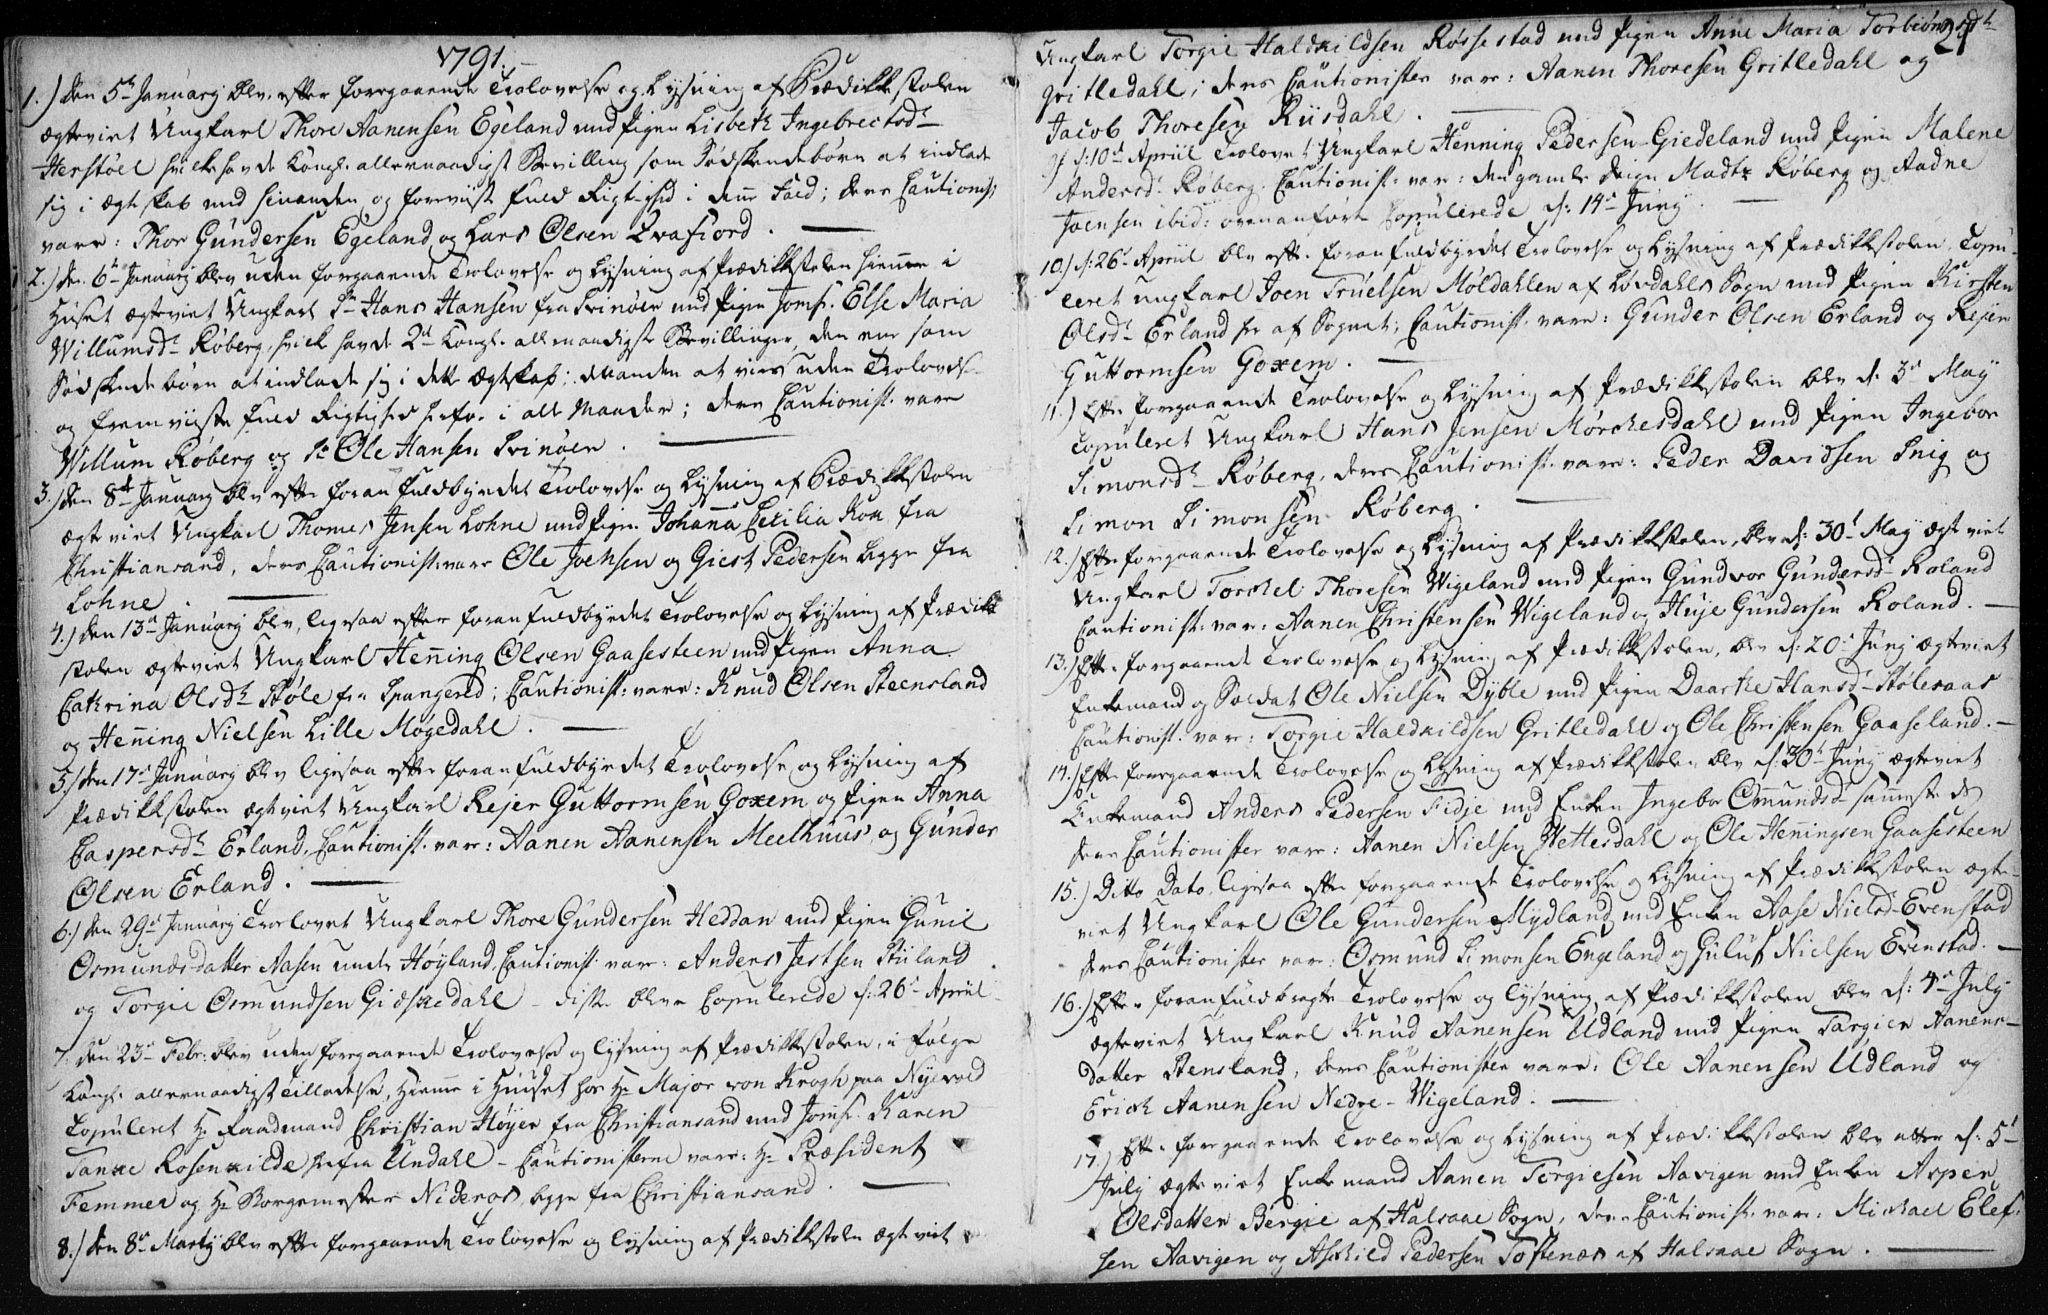 SAK, Sør-Audnedal sokneprestkontor, F/Fa/Fab/L0003: Ministerialbok nr. A 3, 1766-1828, s. 21